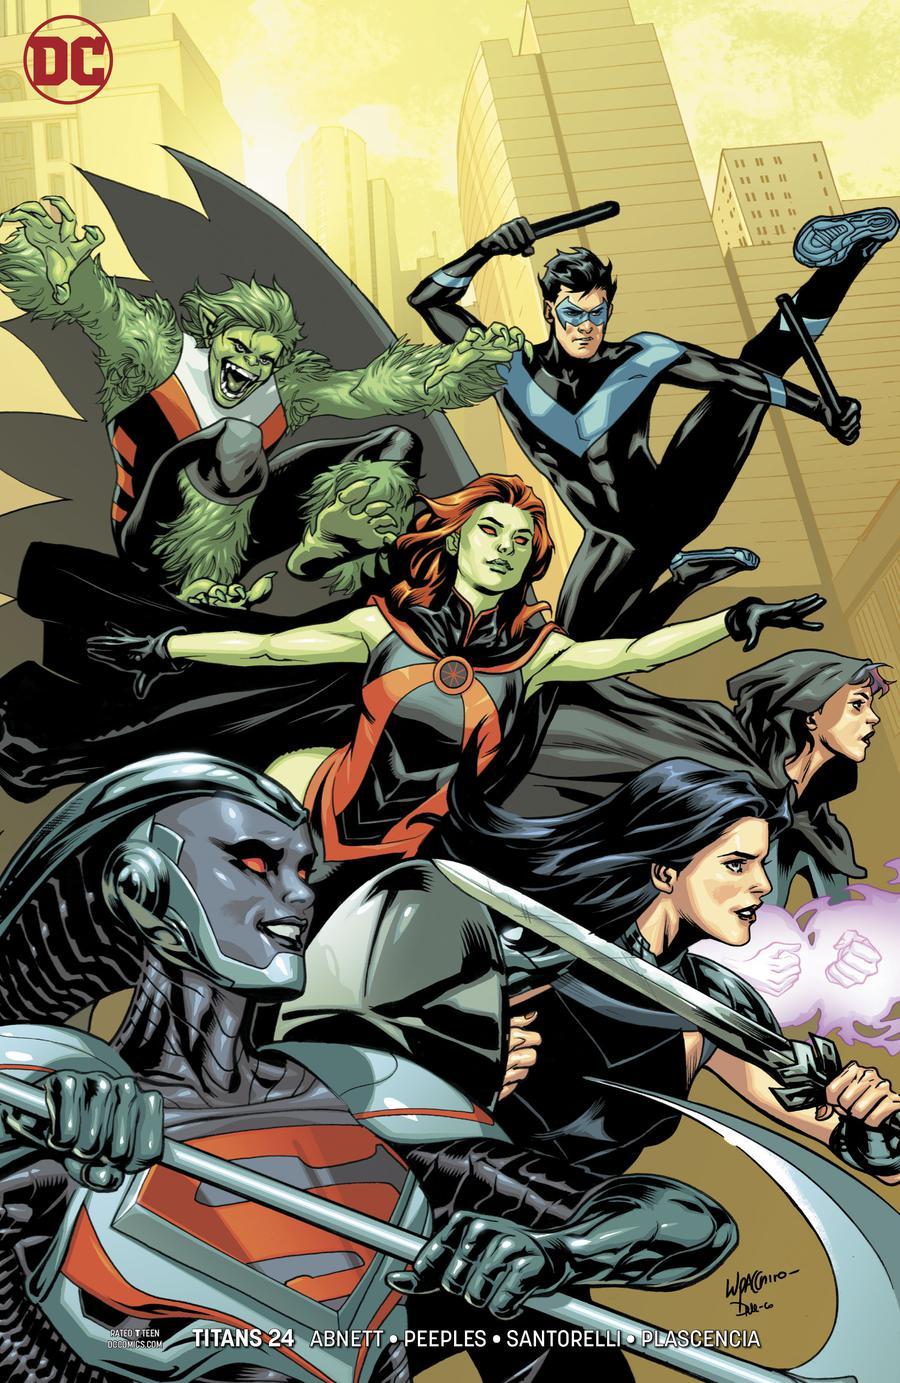 Titans Vol 3 #24 Cover B Variant Emanuela Lupacchino Cover